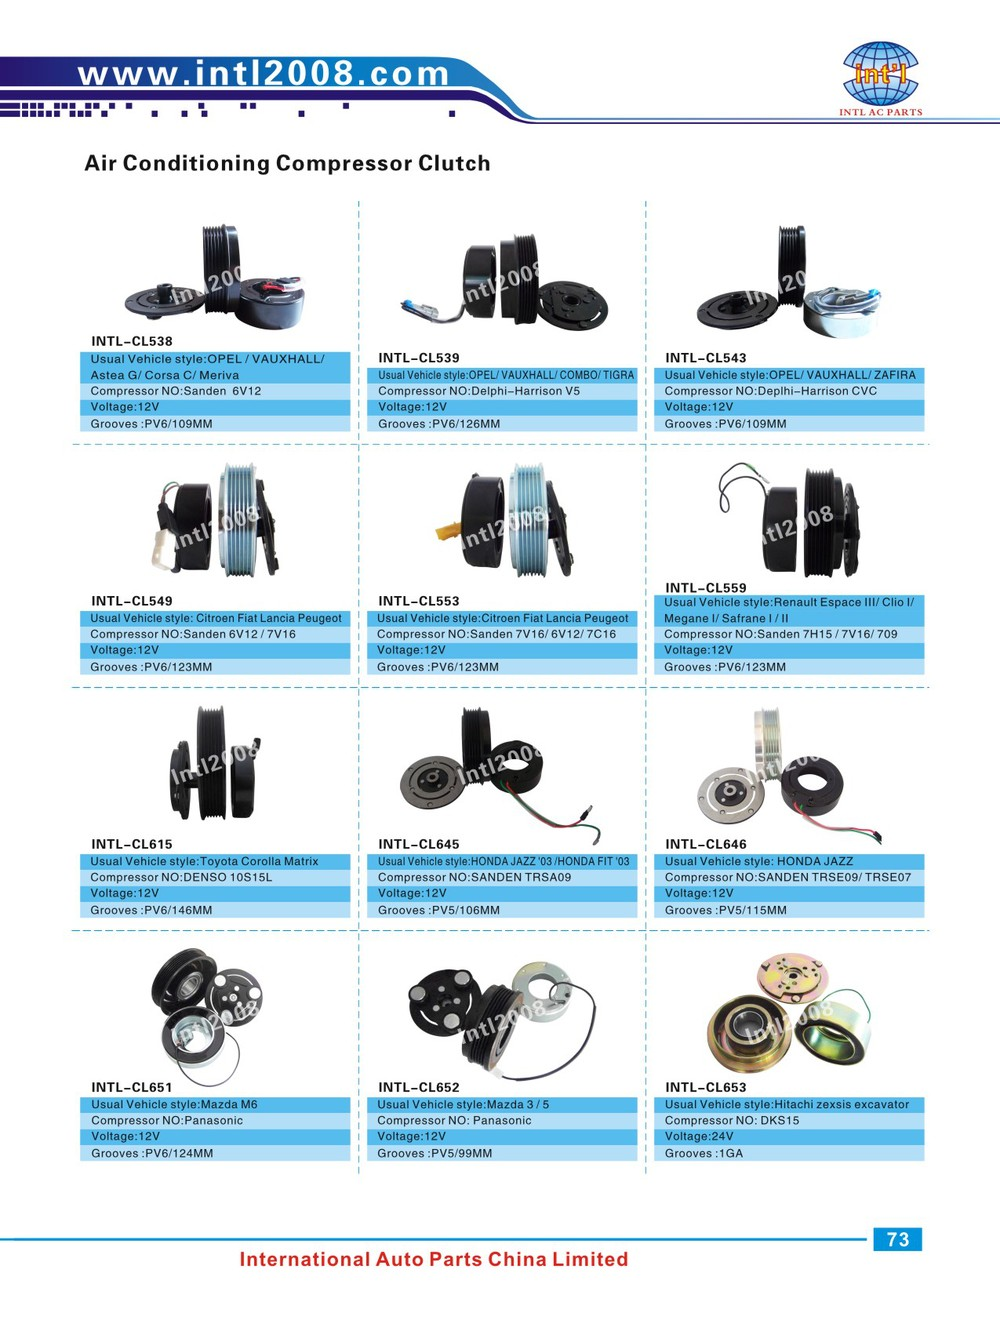 7sbu16c Ac Compressor Clutch For Bmw 3 Series E46 328i 5 E39 Kompresor Seri Denso X3 Co 105116c 77396 447100 7470 6904014 In Air Conditioning Installation From